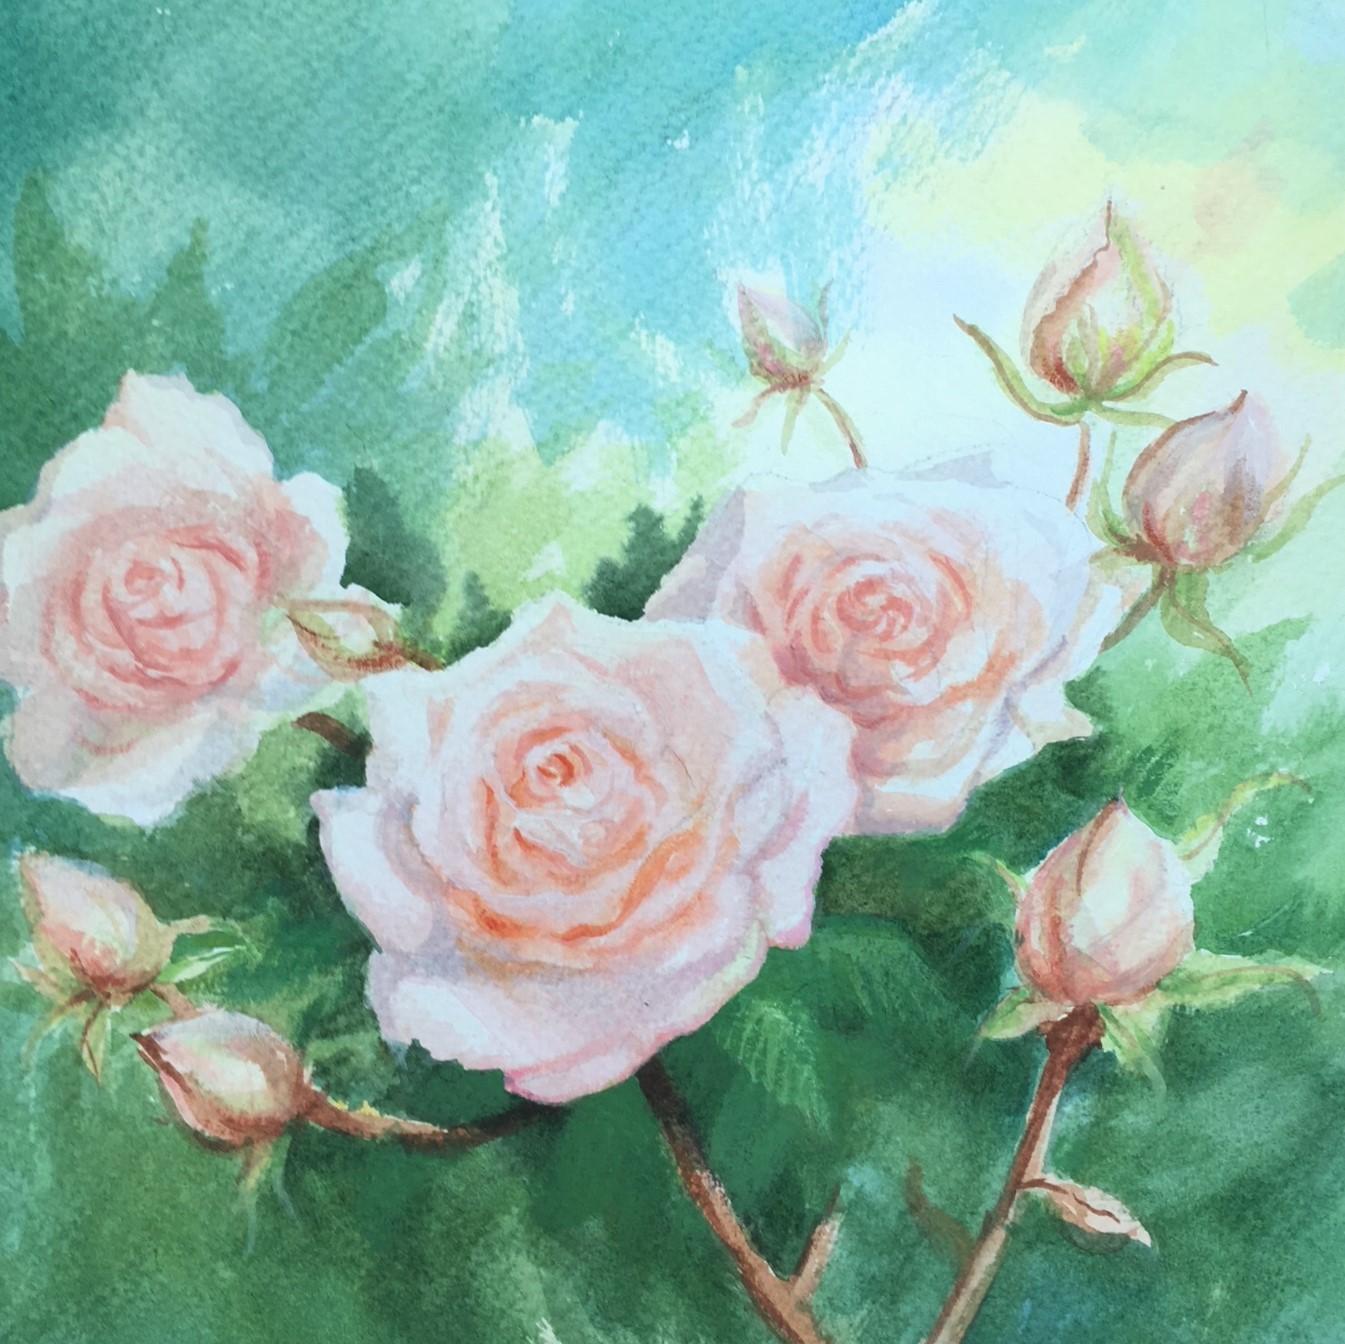 Alnwick Roses